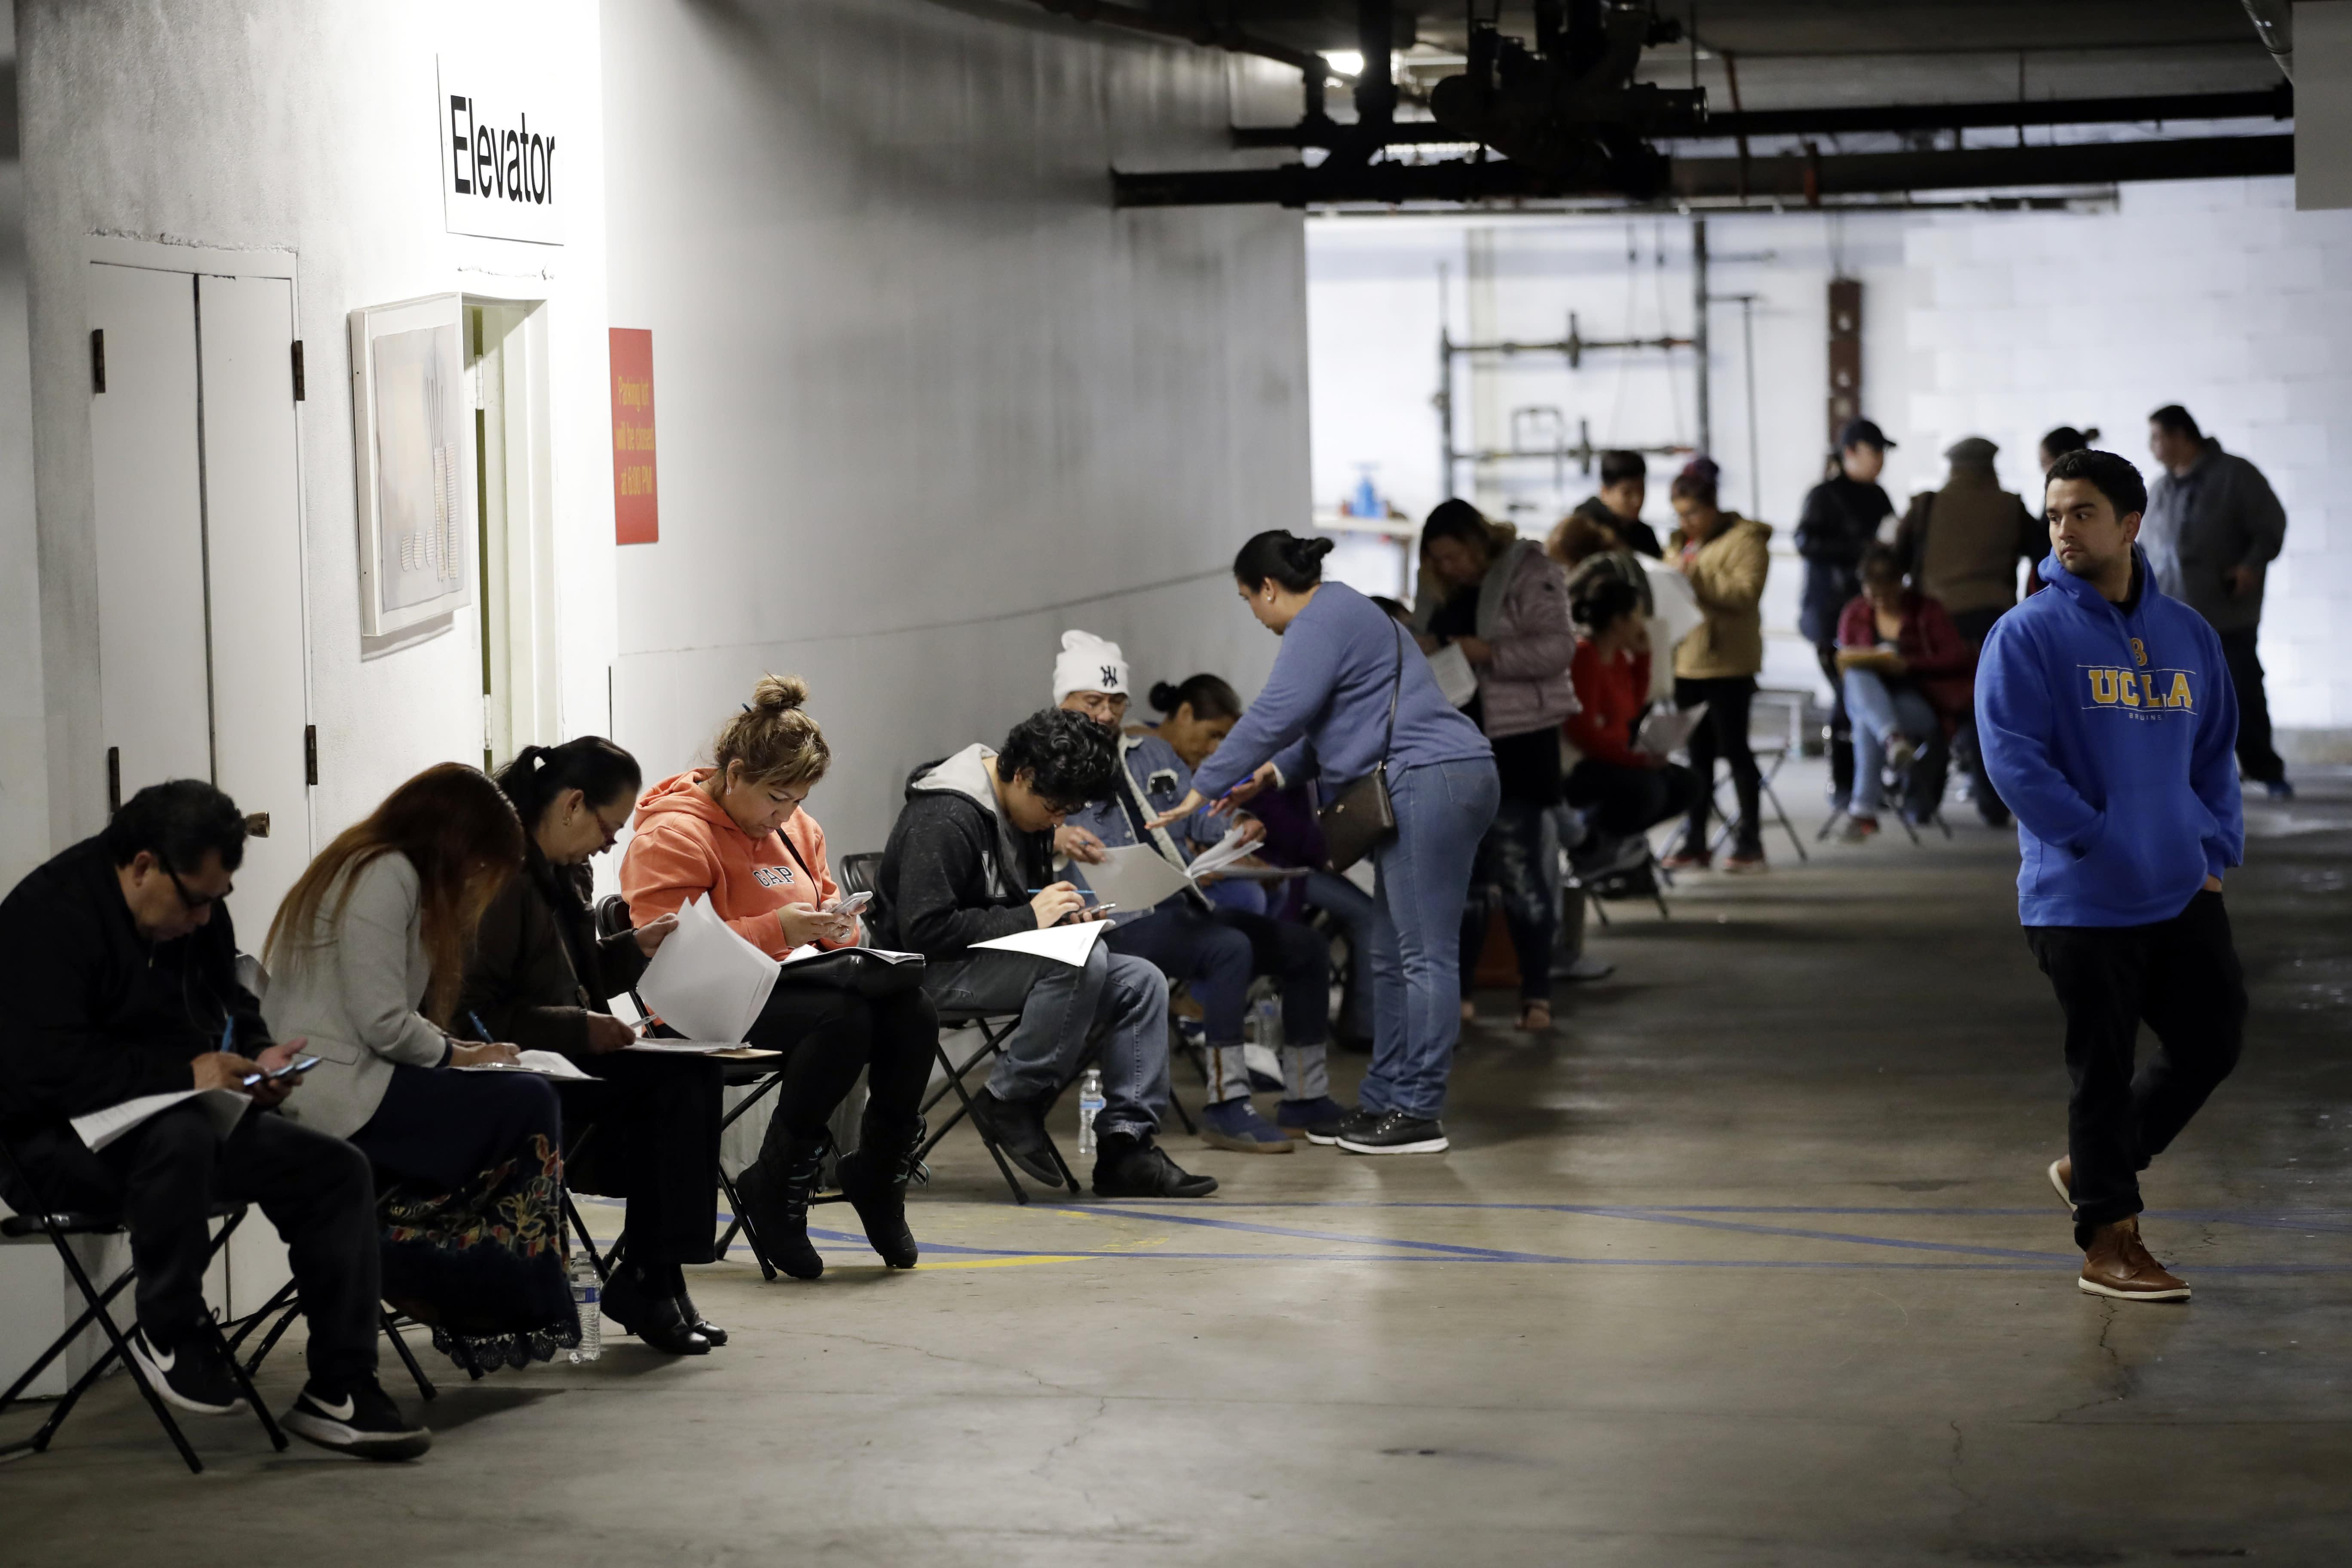 U.S. unemployment will still surge to 25% because of COVID-19 economic devastation: Goldman Sachs